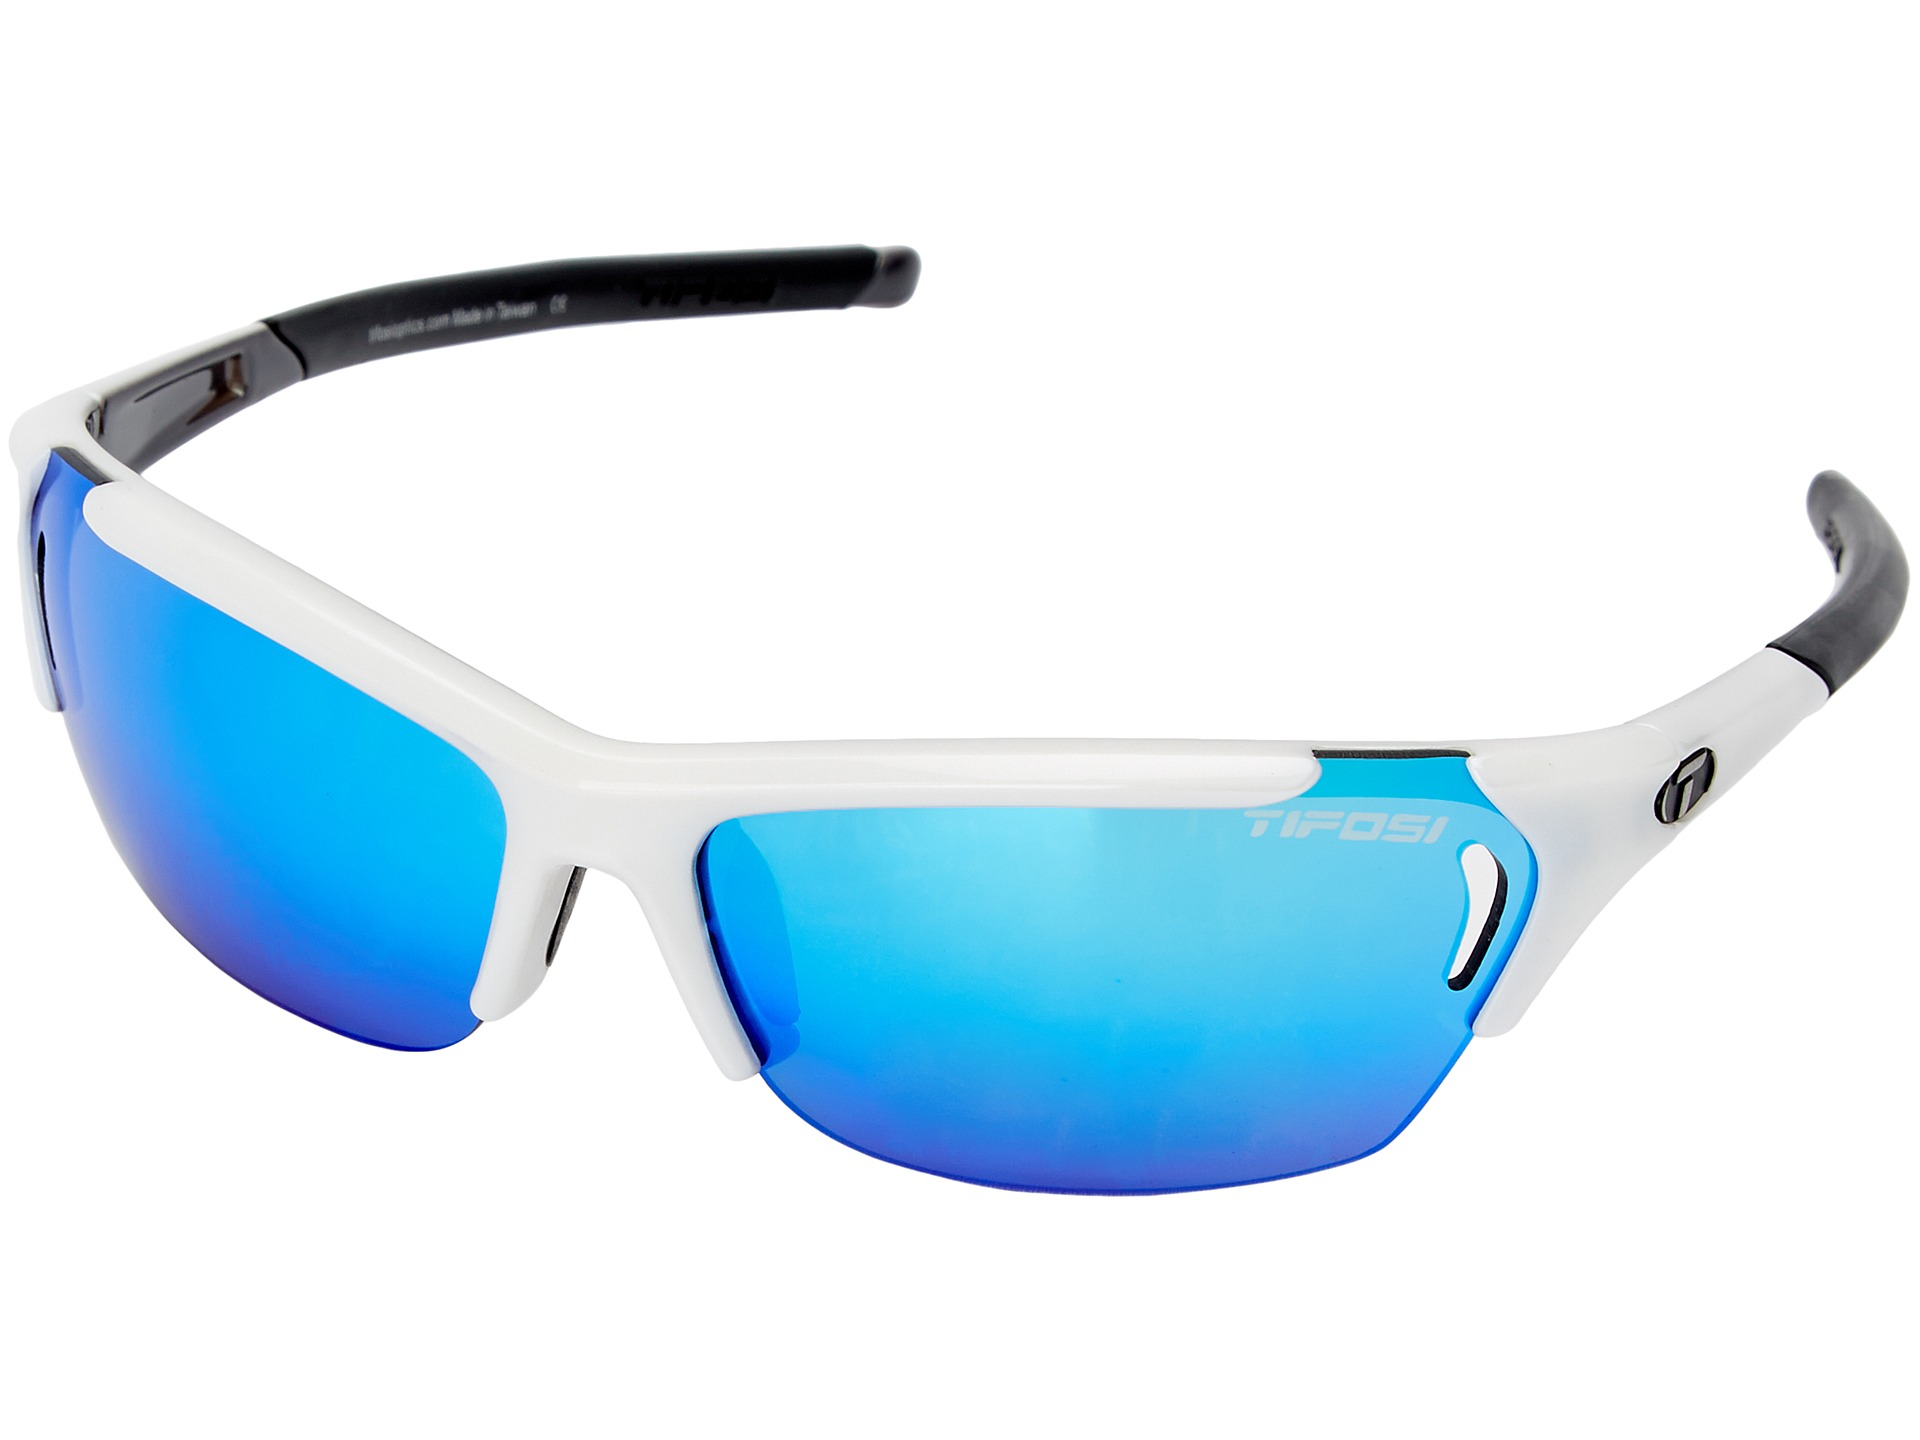 09b501a503 Gafas Oakley Replica Chinas   United Nations System Chief Executives ...